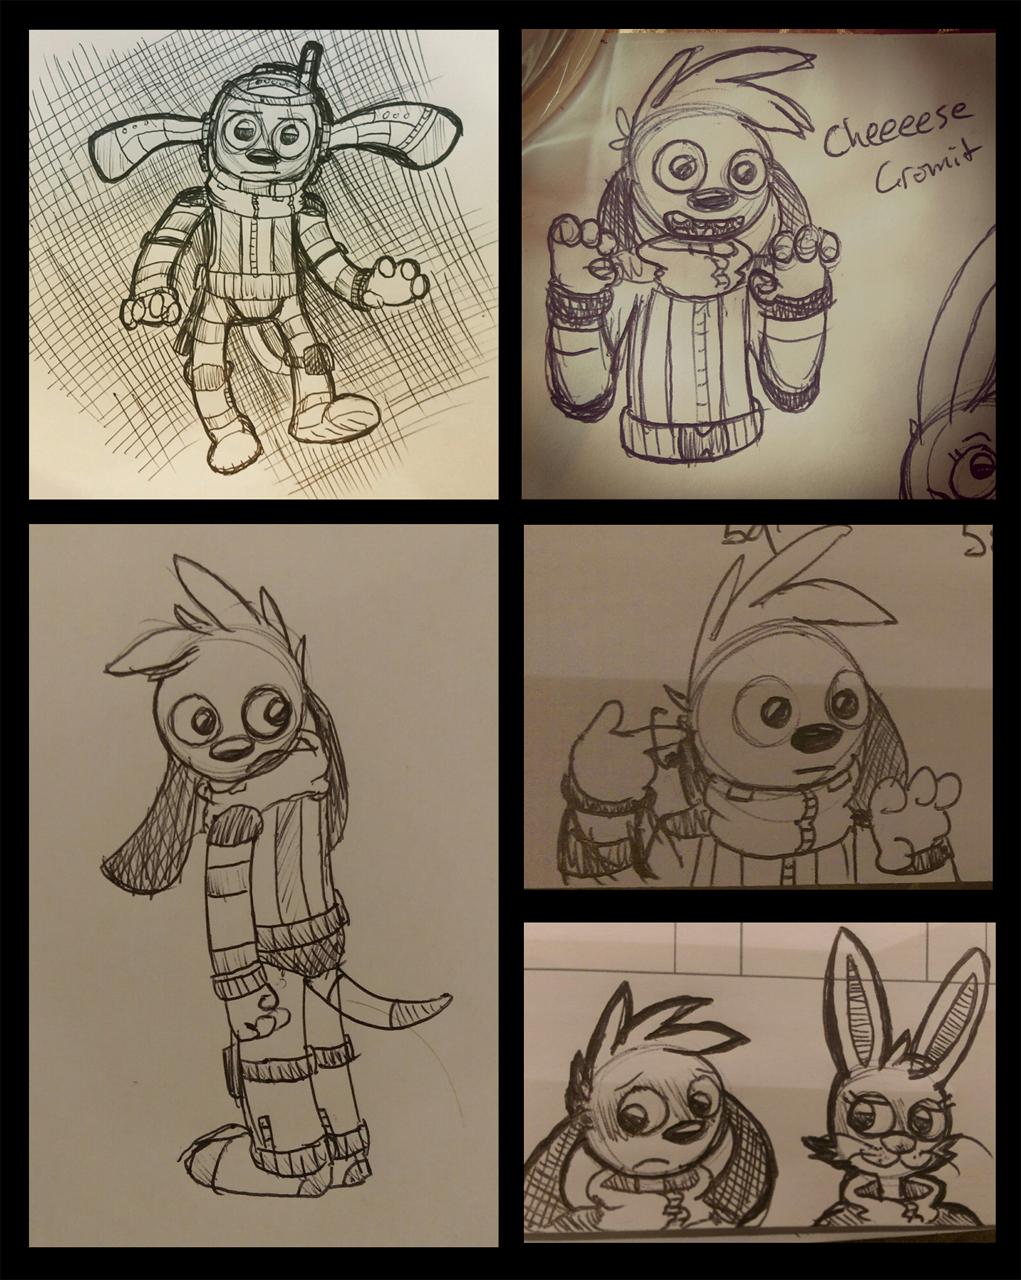 xmas doodles